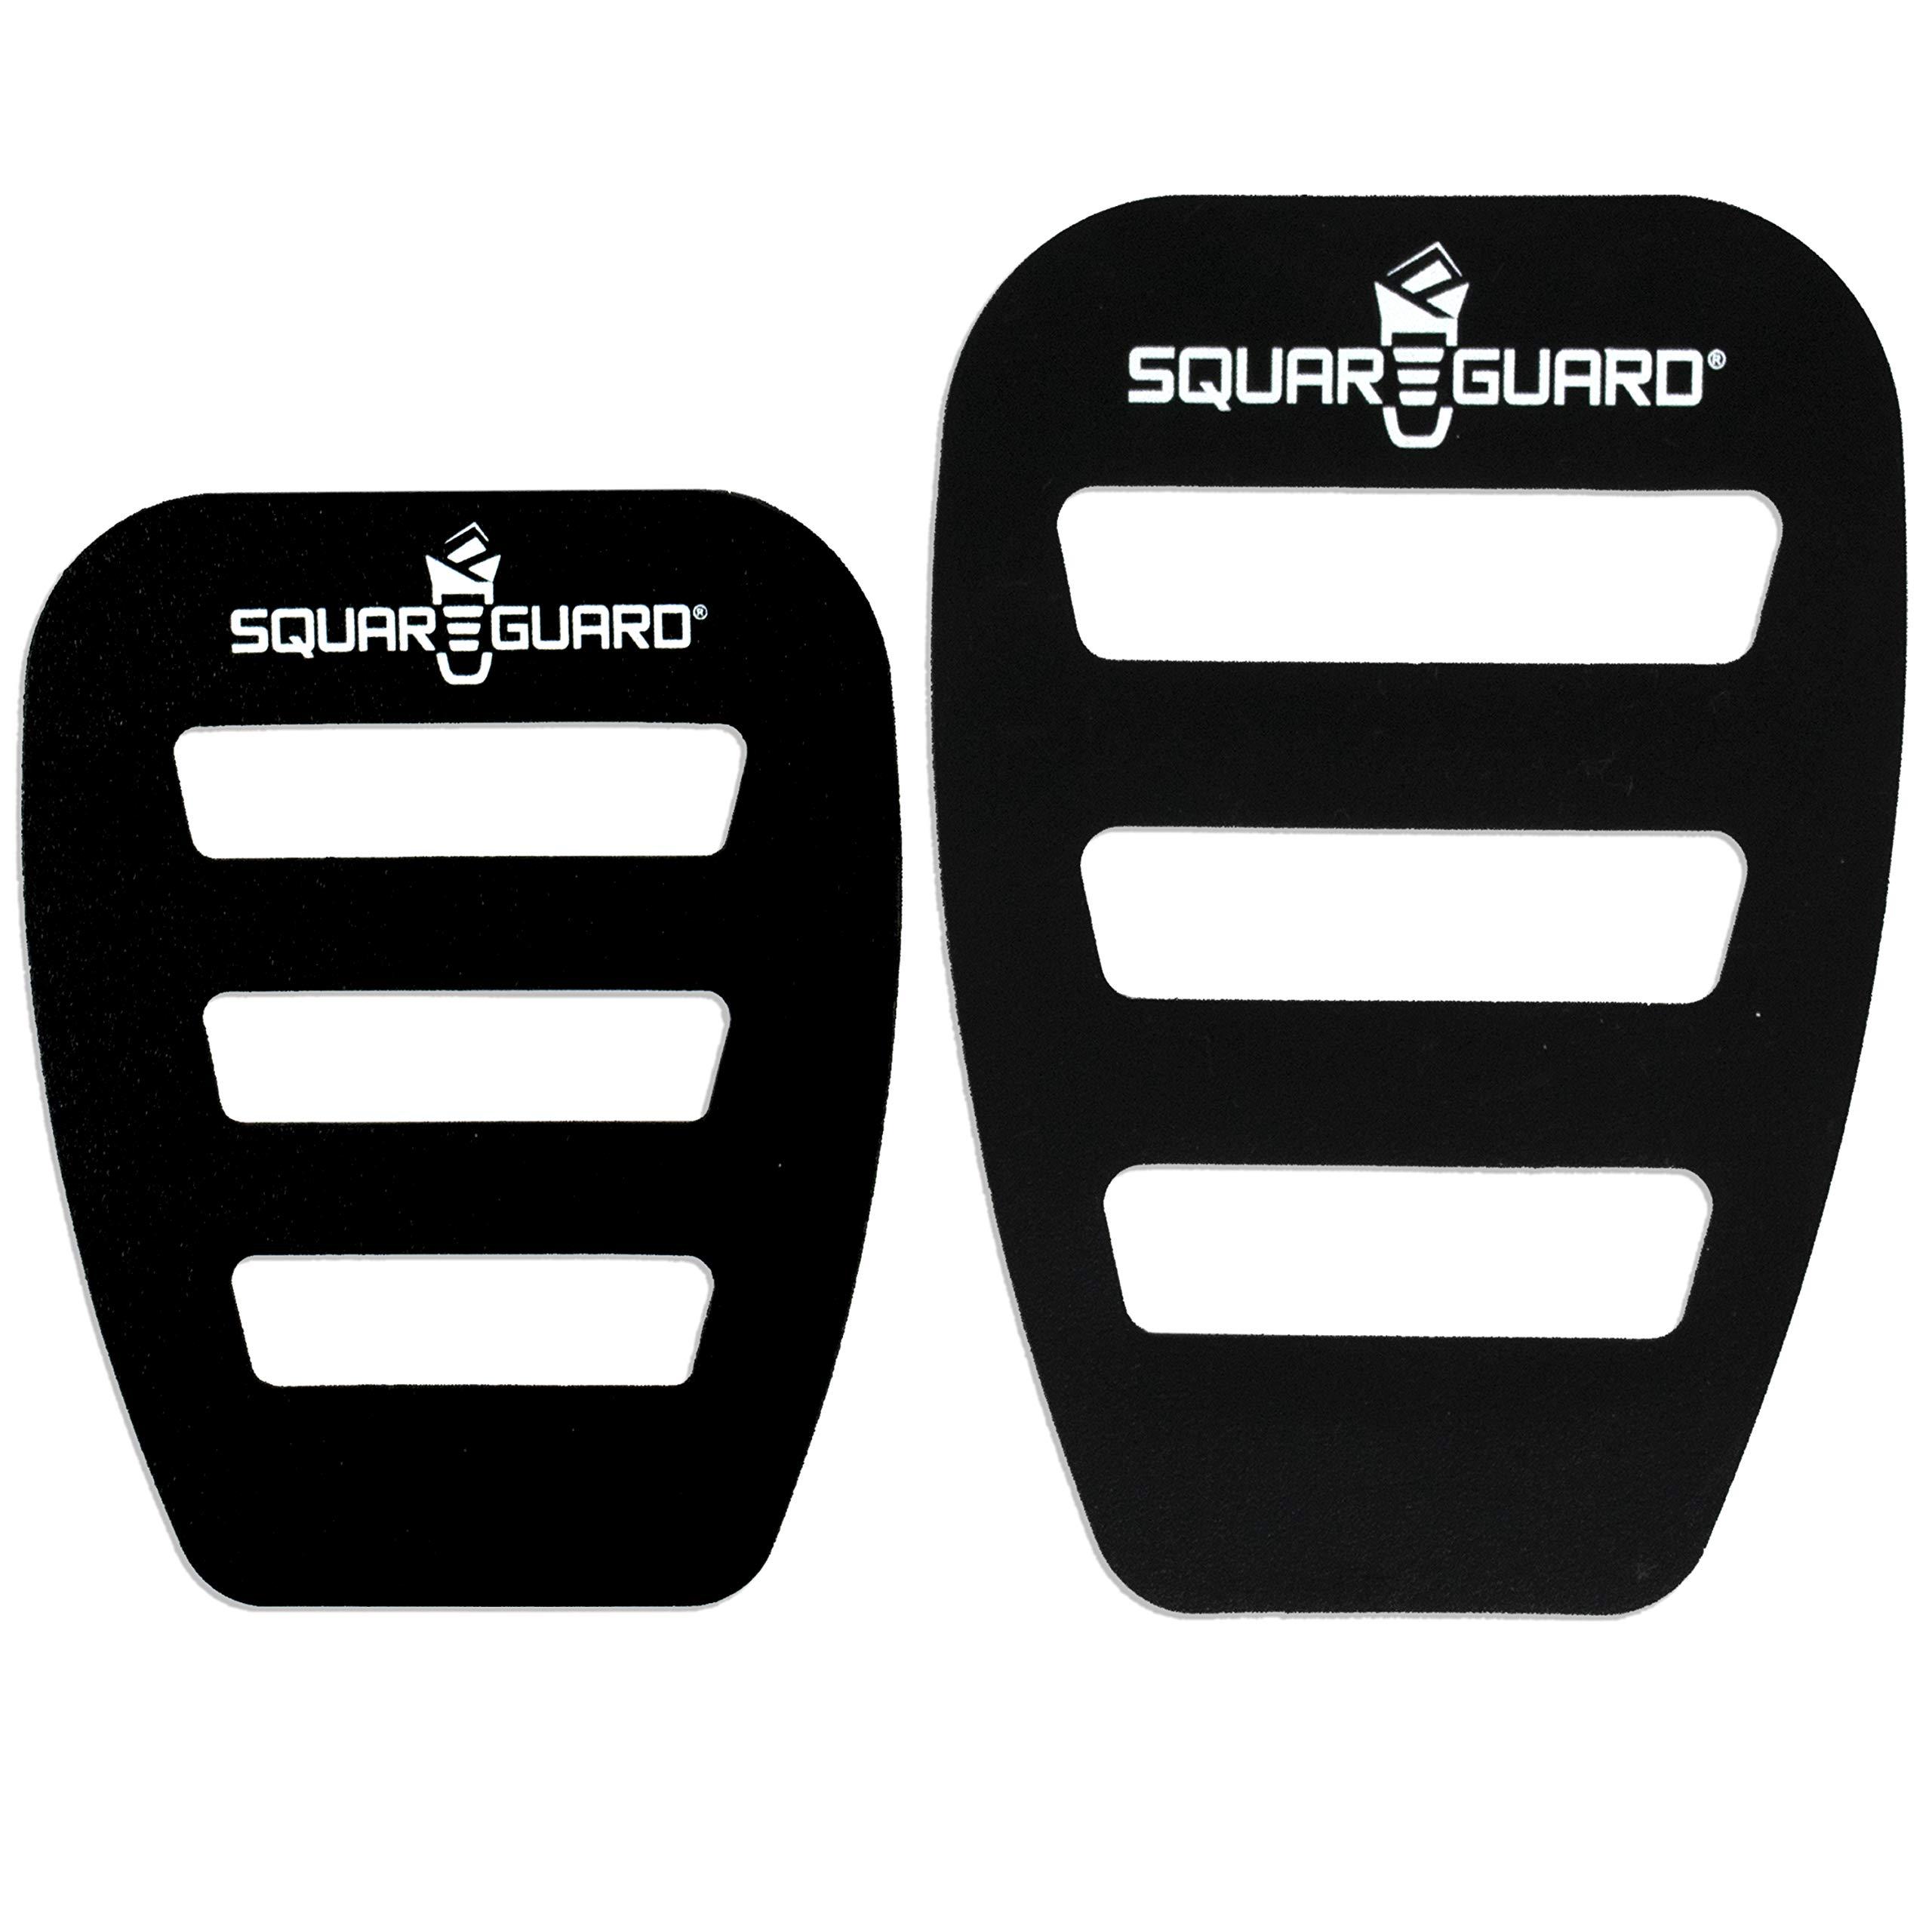 SquareGuard Pocket Square Holder Variety